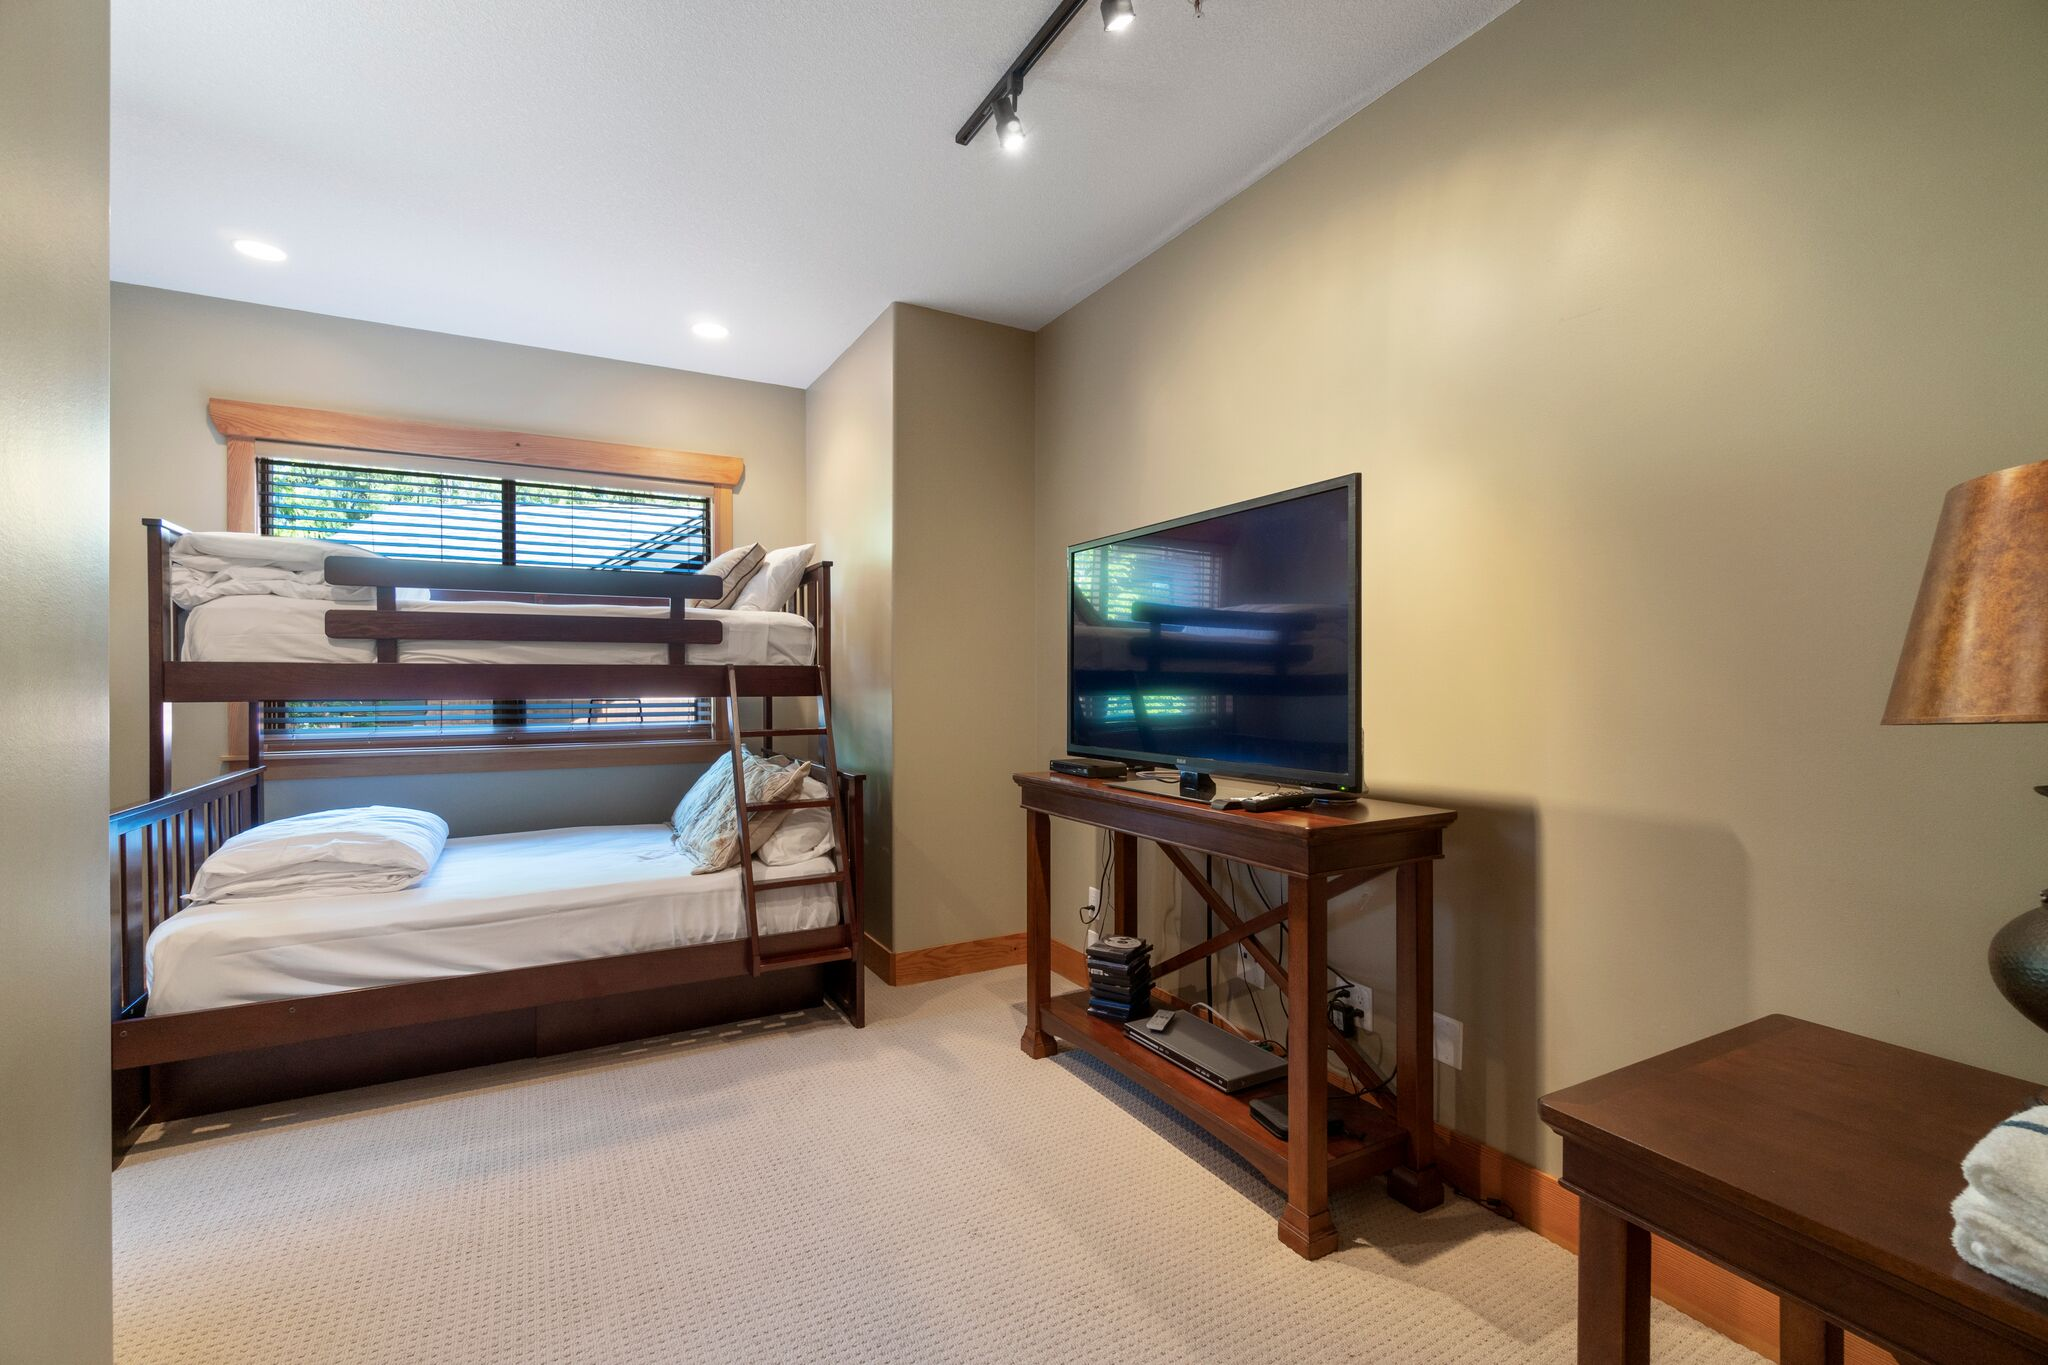 Bedroom 4 - Double/Single Bunk